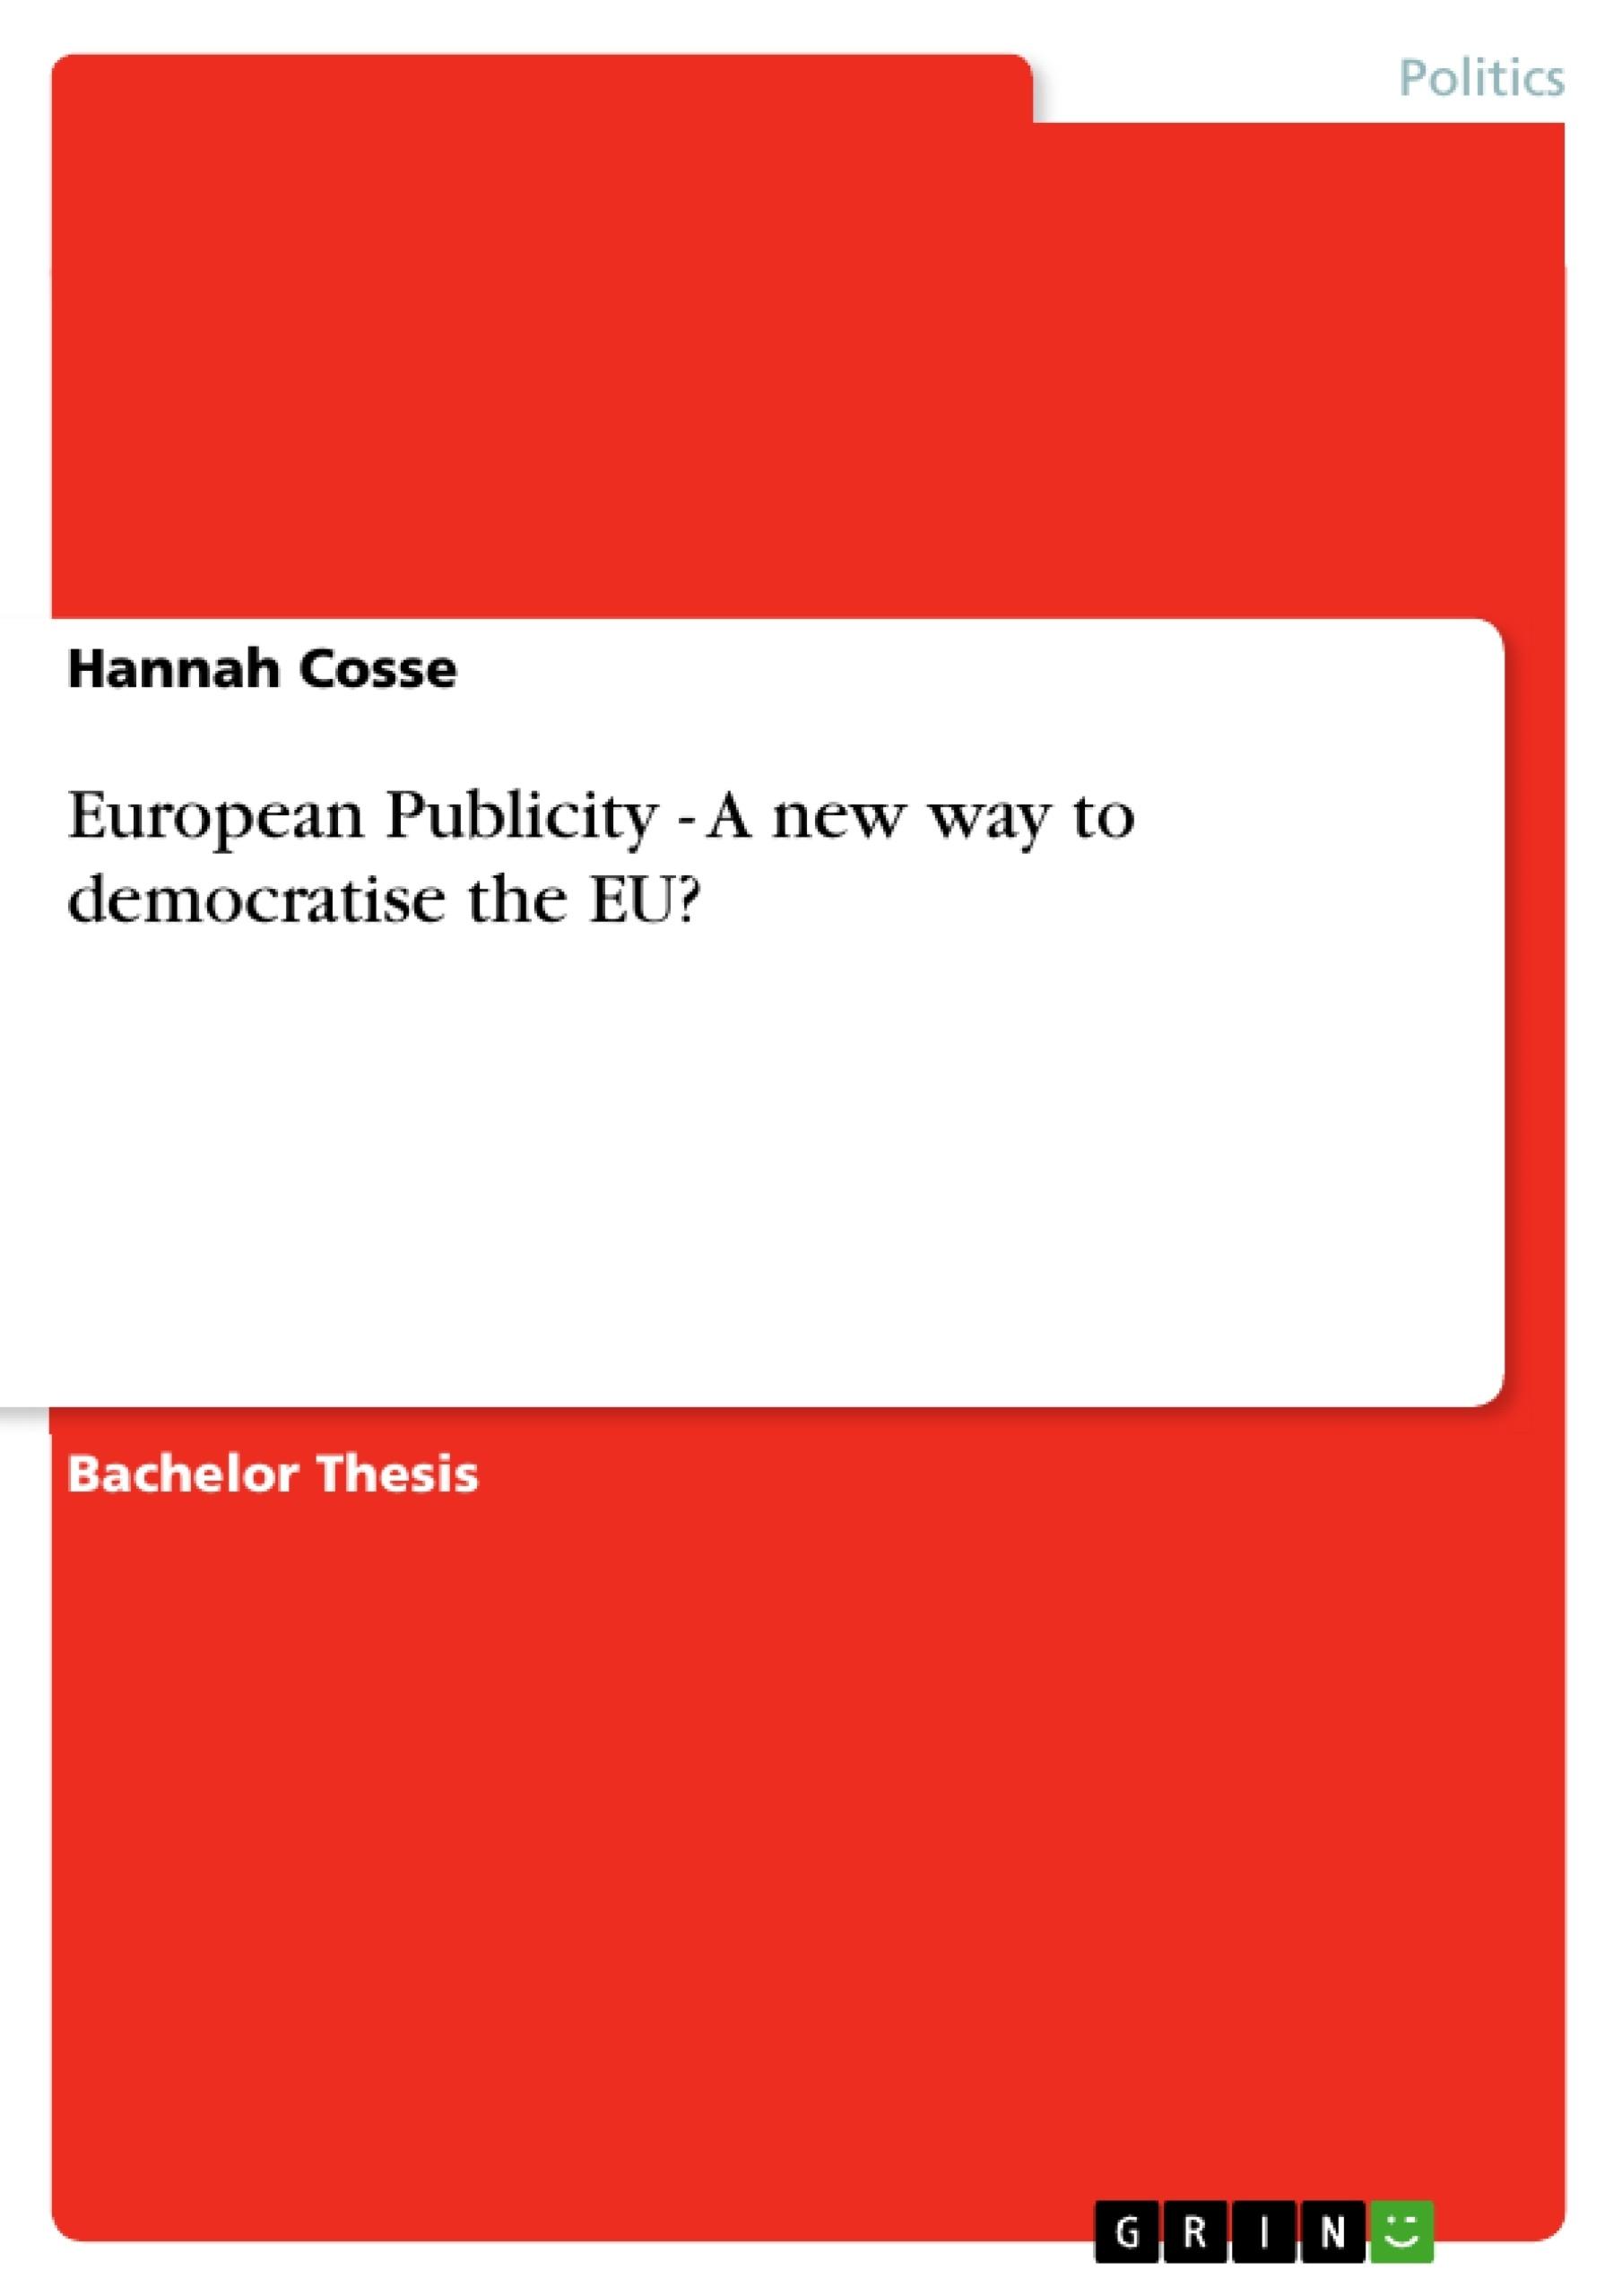 Title: European Publicity - A new way to democratise the EU?